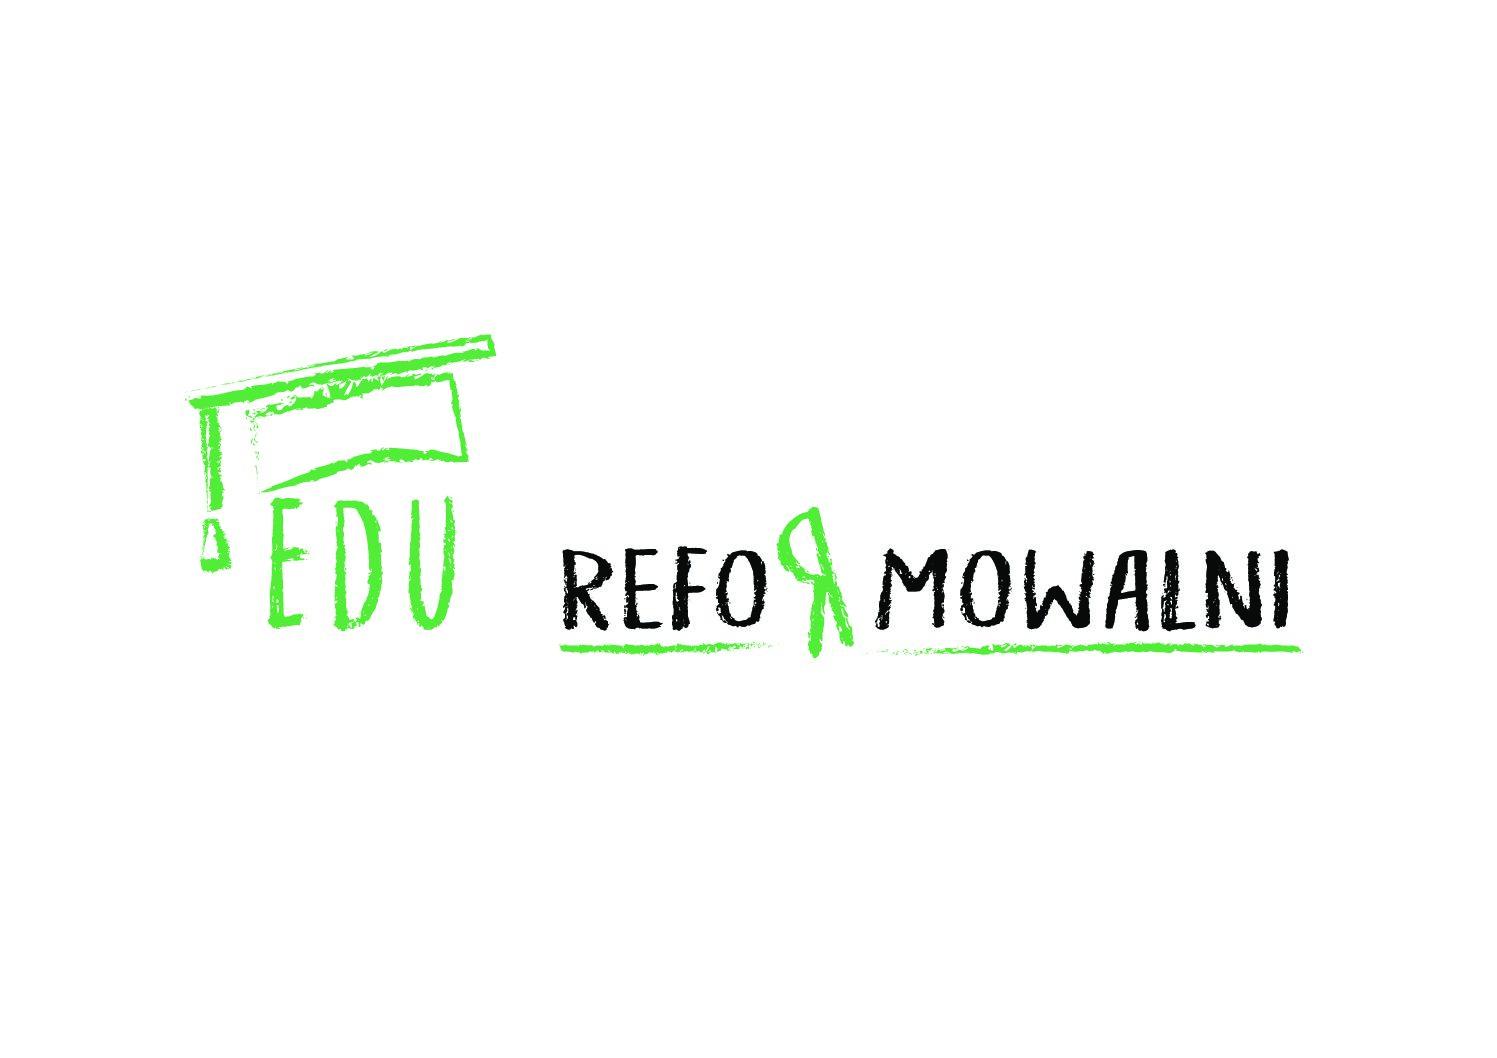 EDUreformowalni